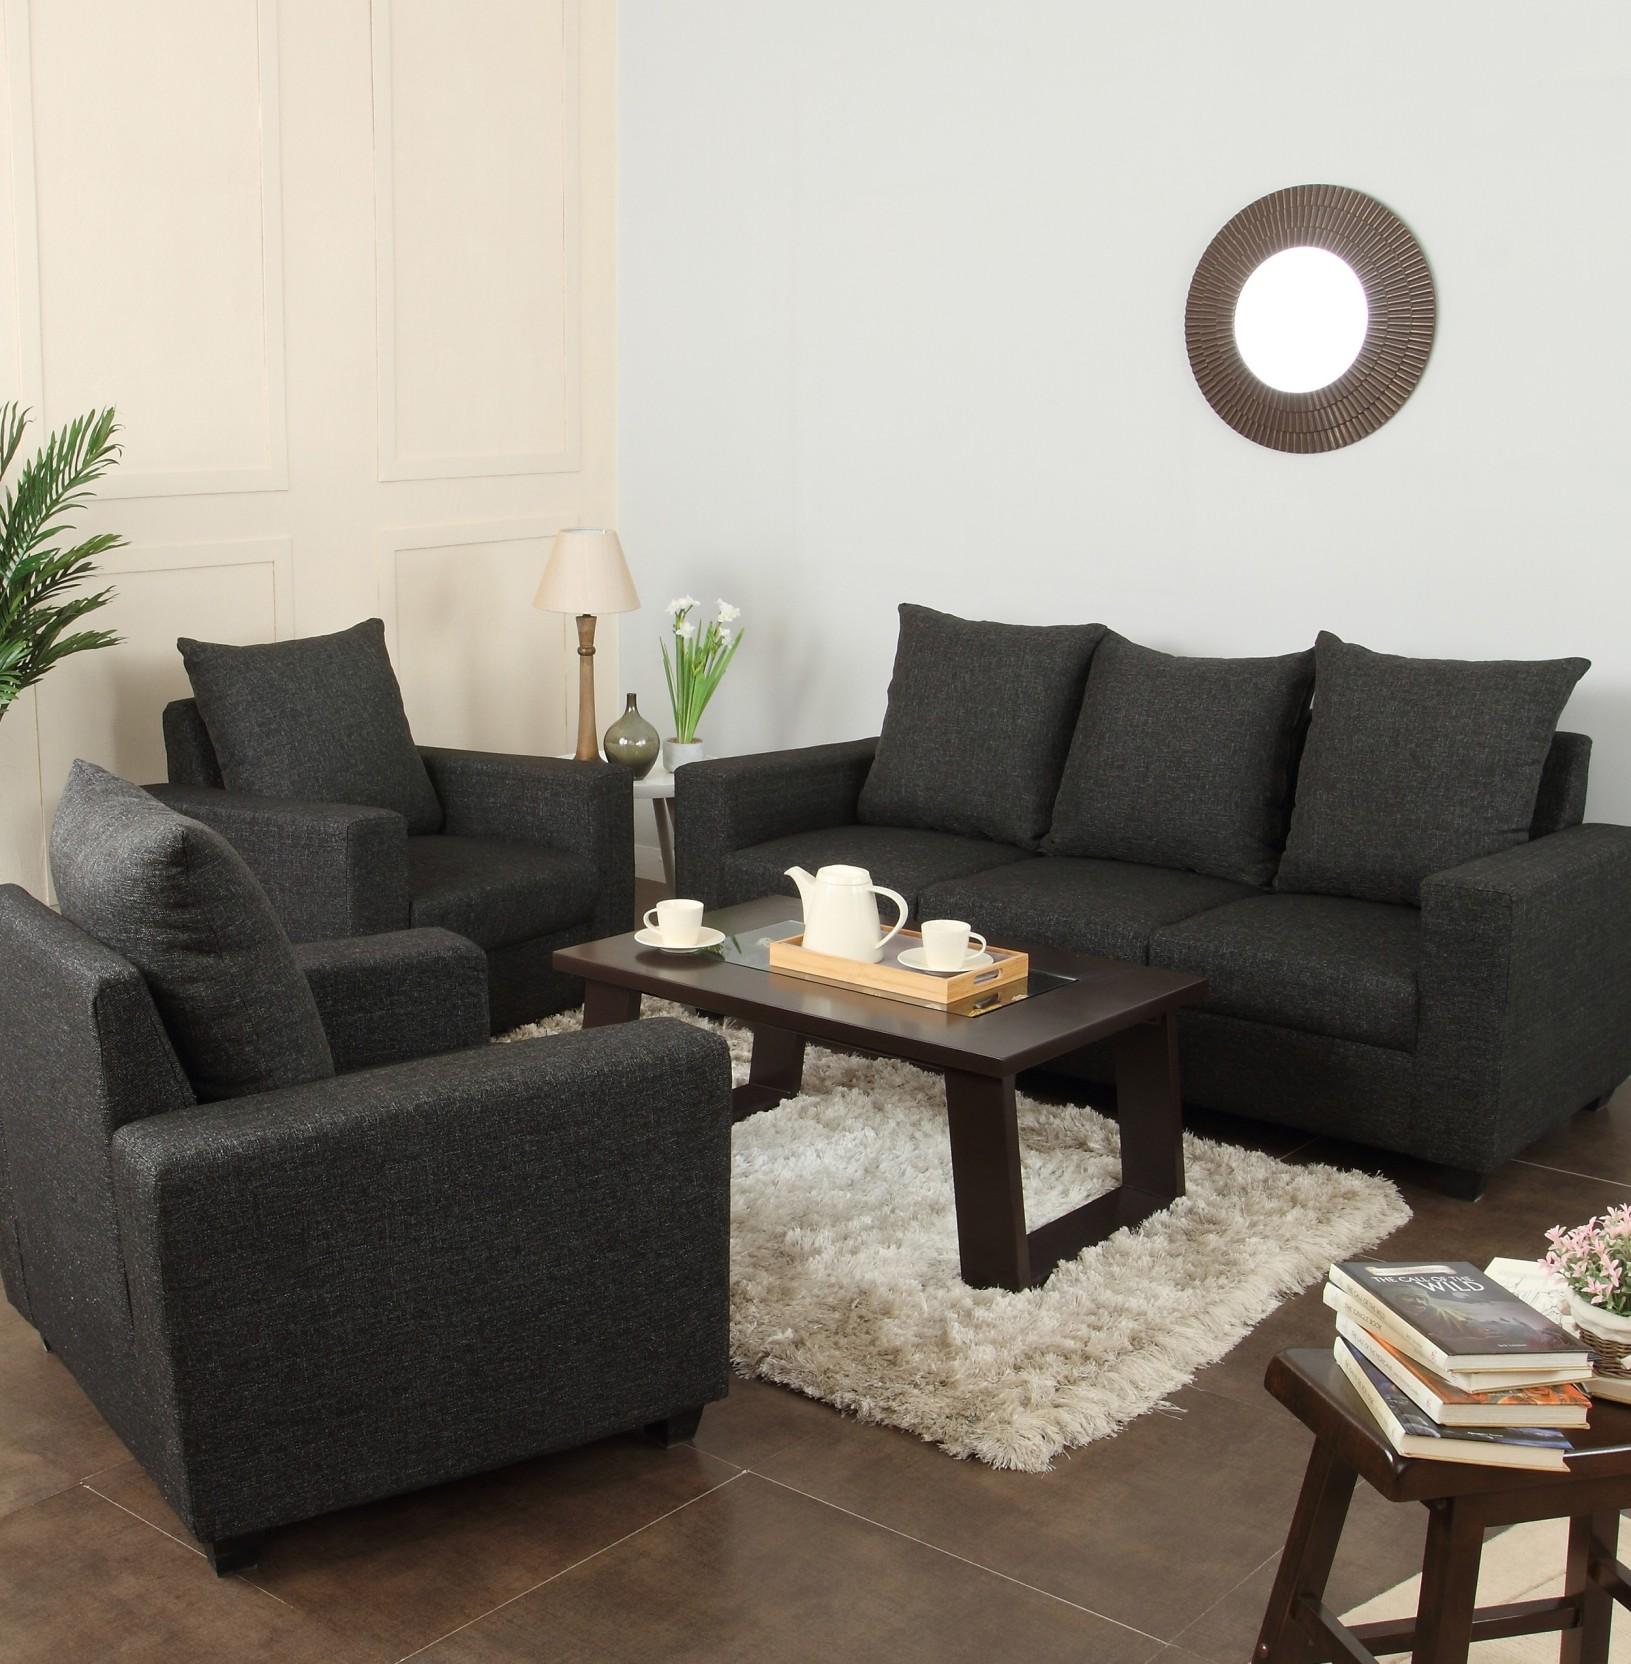 Sofa Sets Online: Furnicity Fabric 3 + 1 + 1 Grey Sofa Set Price In India